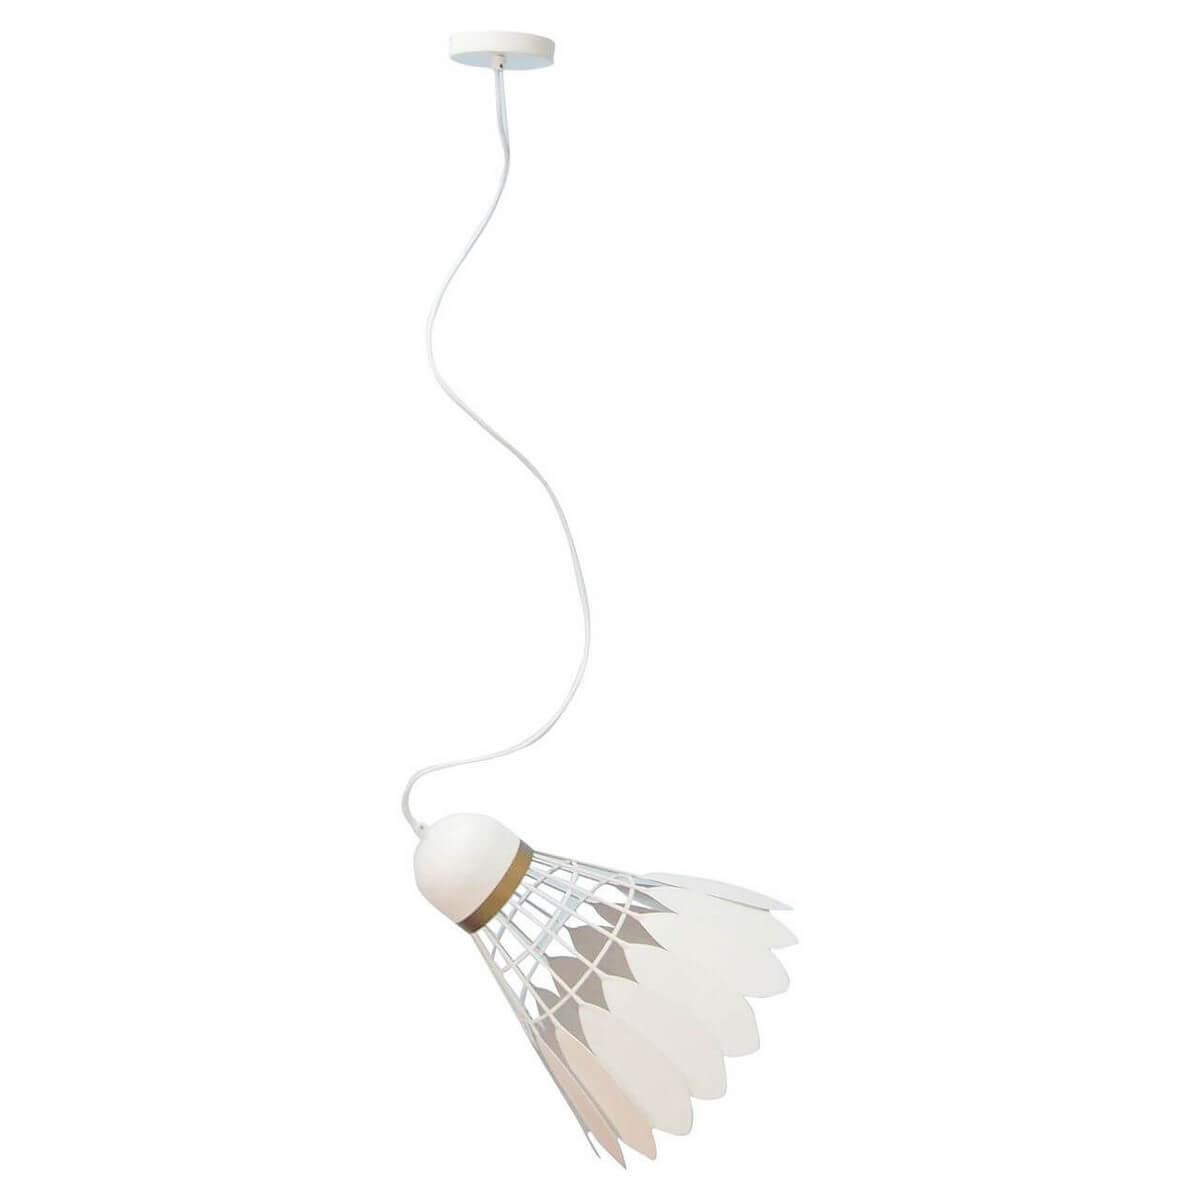 Светильник Lussole GRLSP-8069 Bristol подвесной светильник lussole loft bristol grlsp 8069